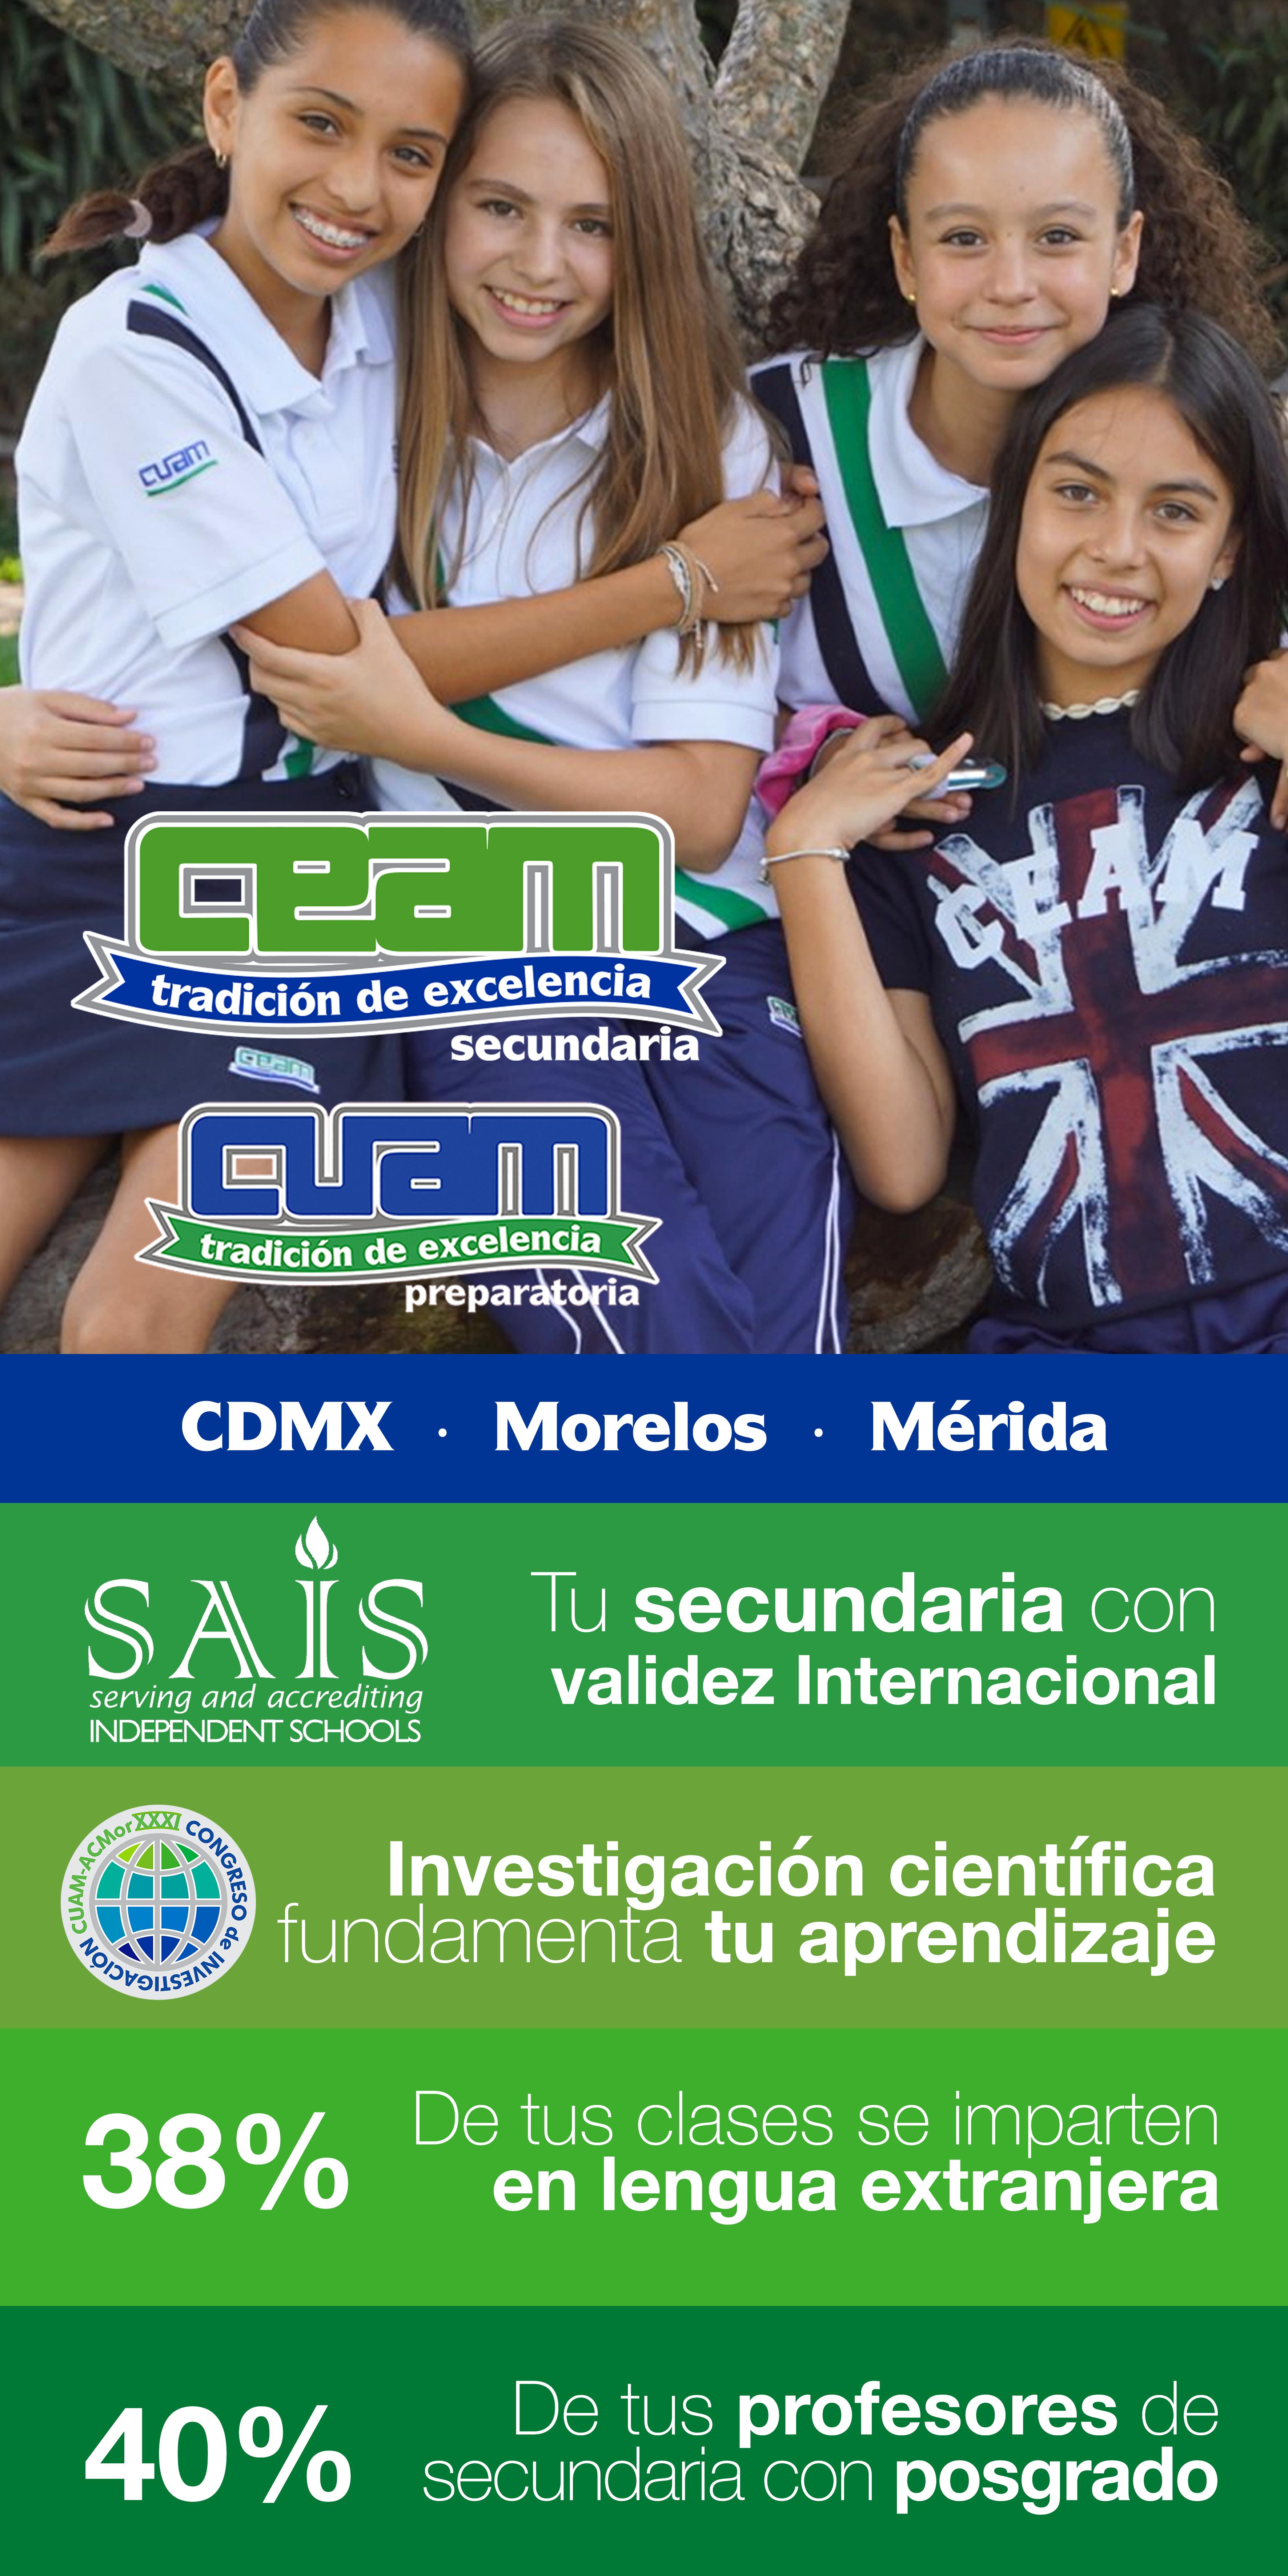 Secundaria Global CEAM